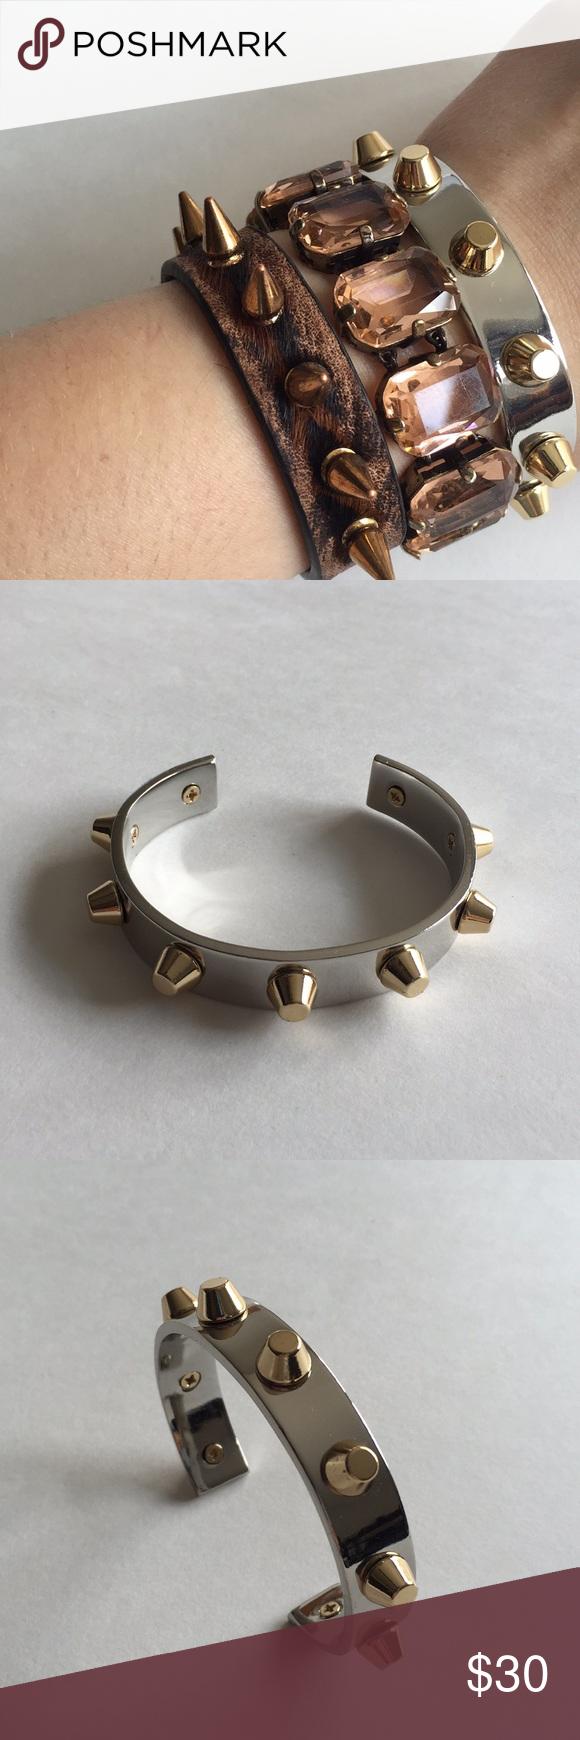 Nwot cwonder goldsilver studded cuff bracelet nwt gold studs